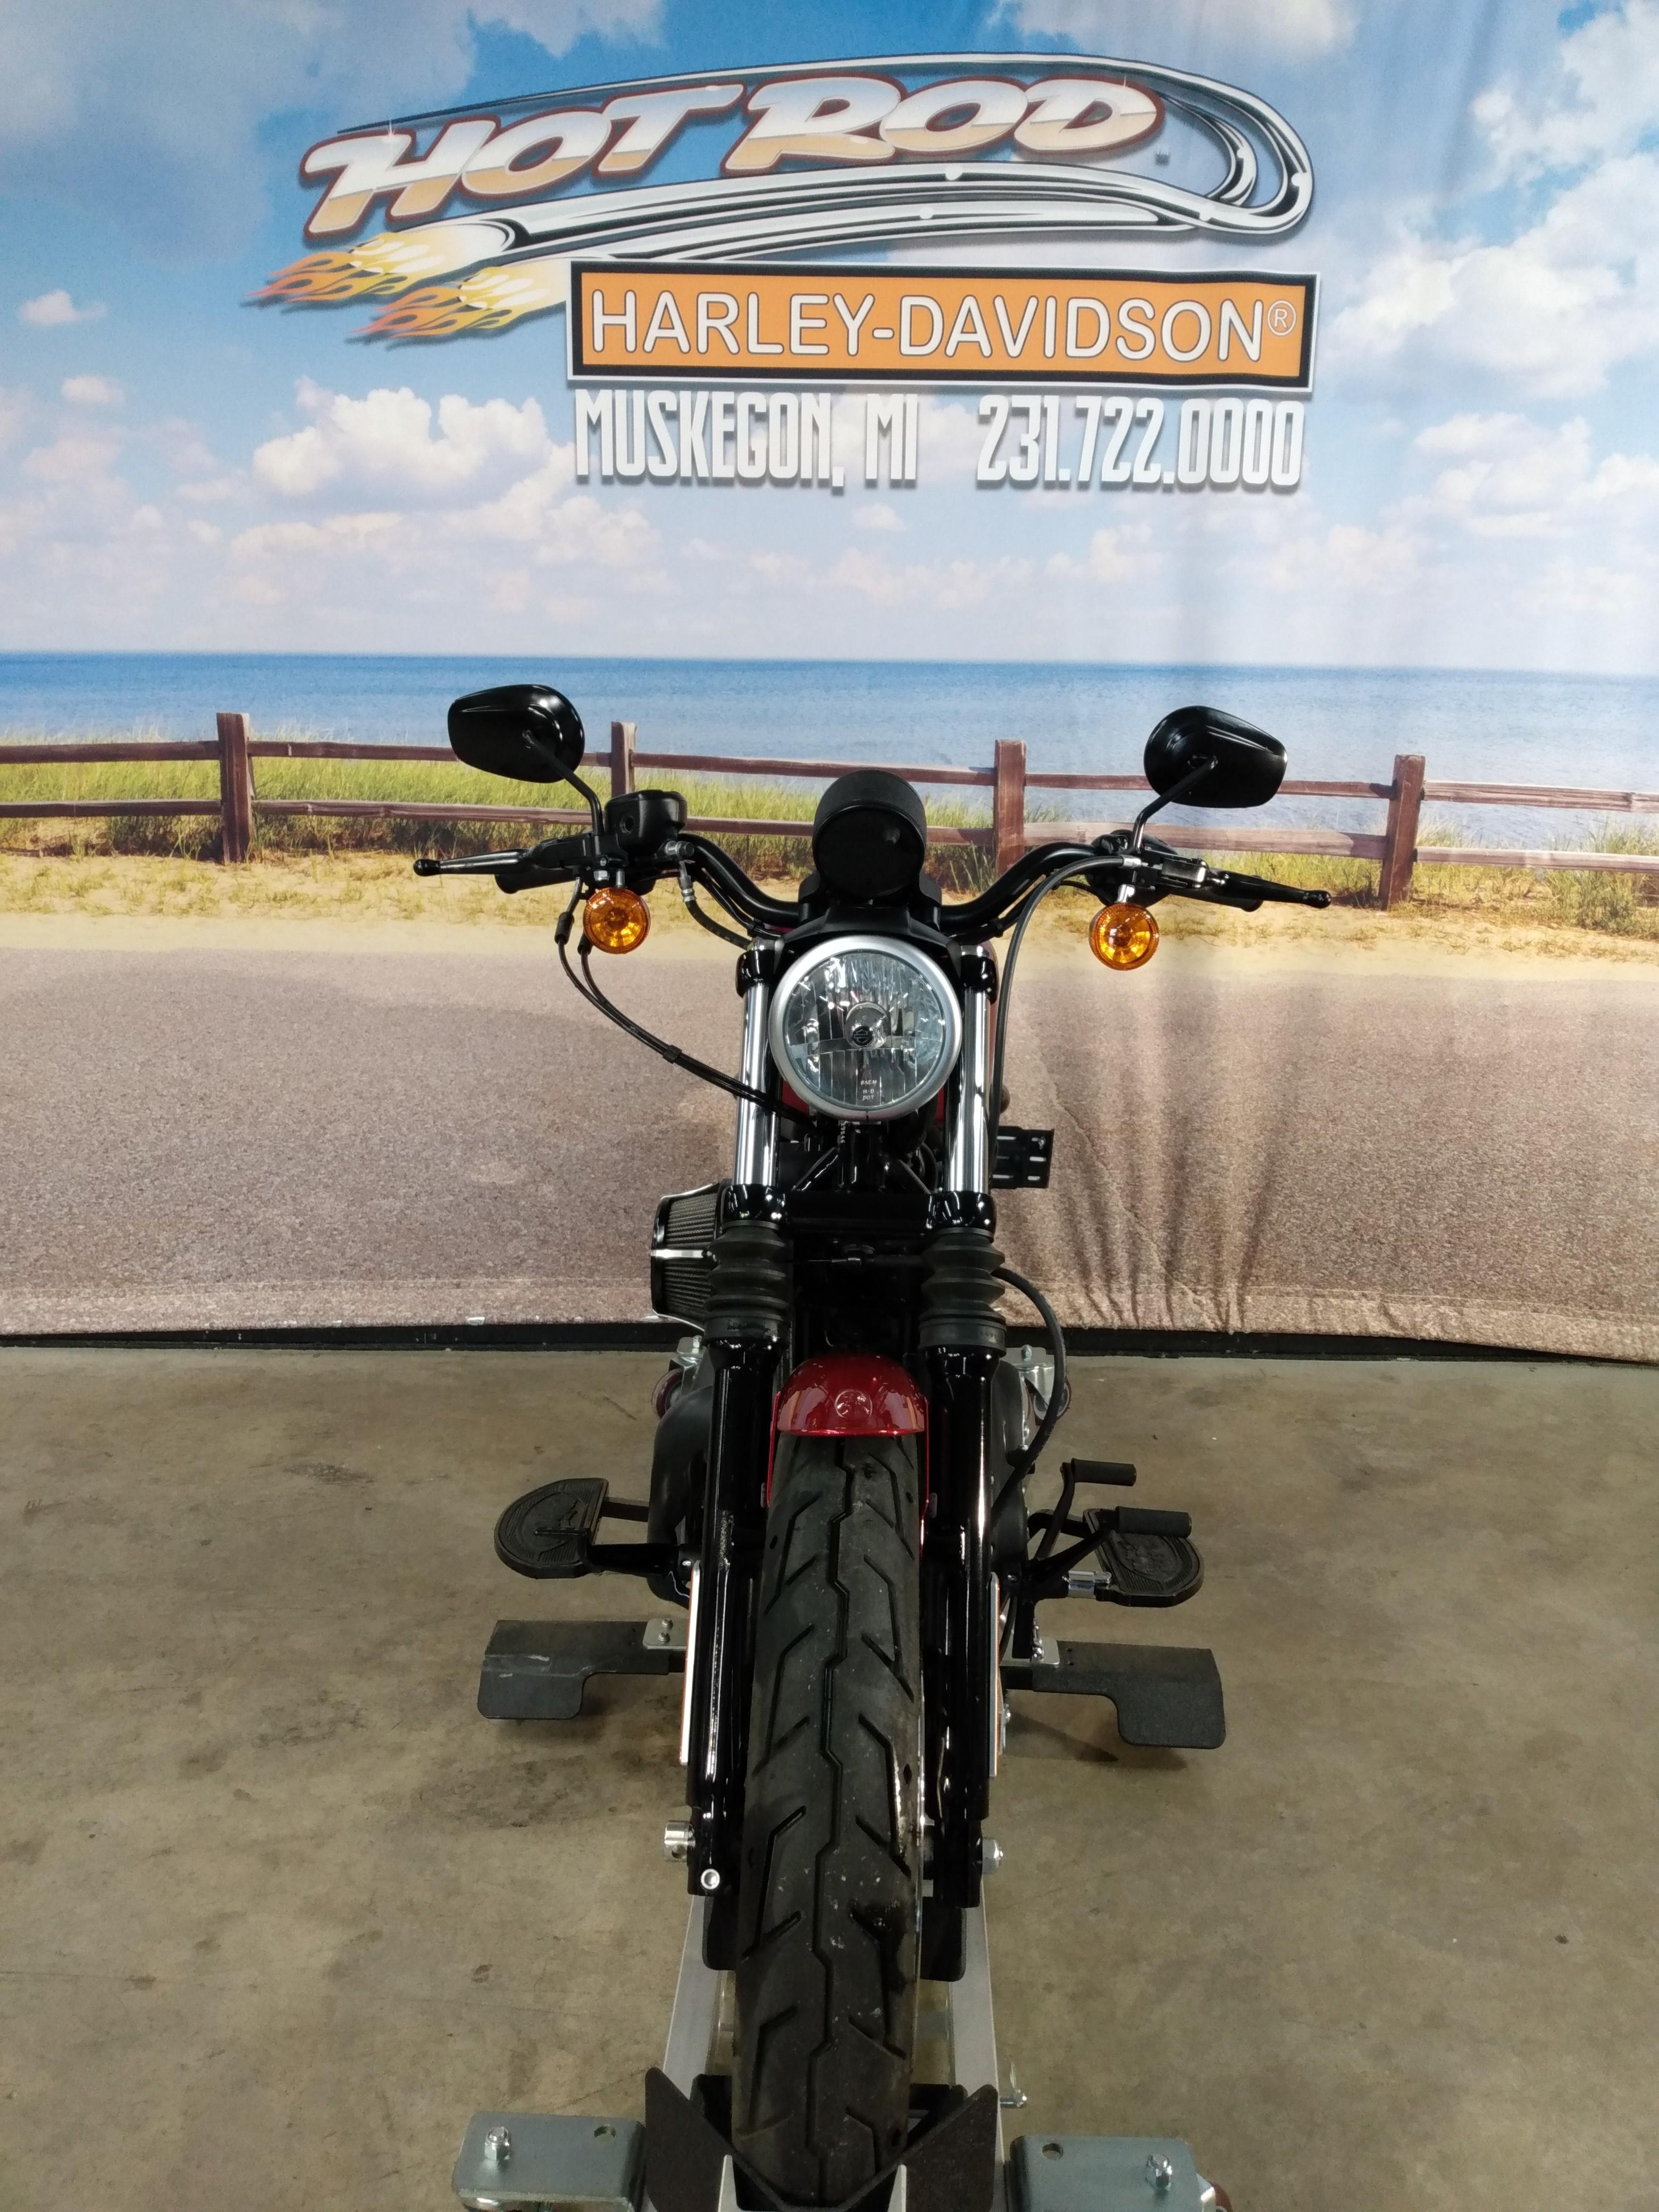 2012 Harley-Davidson Sportster Iron 883 at Hot Rod Harley-Davidson